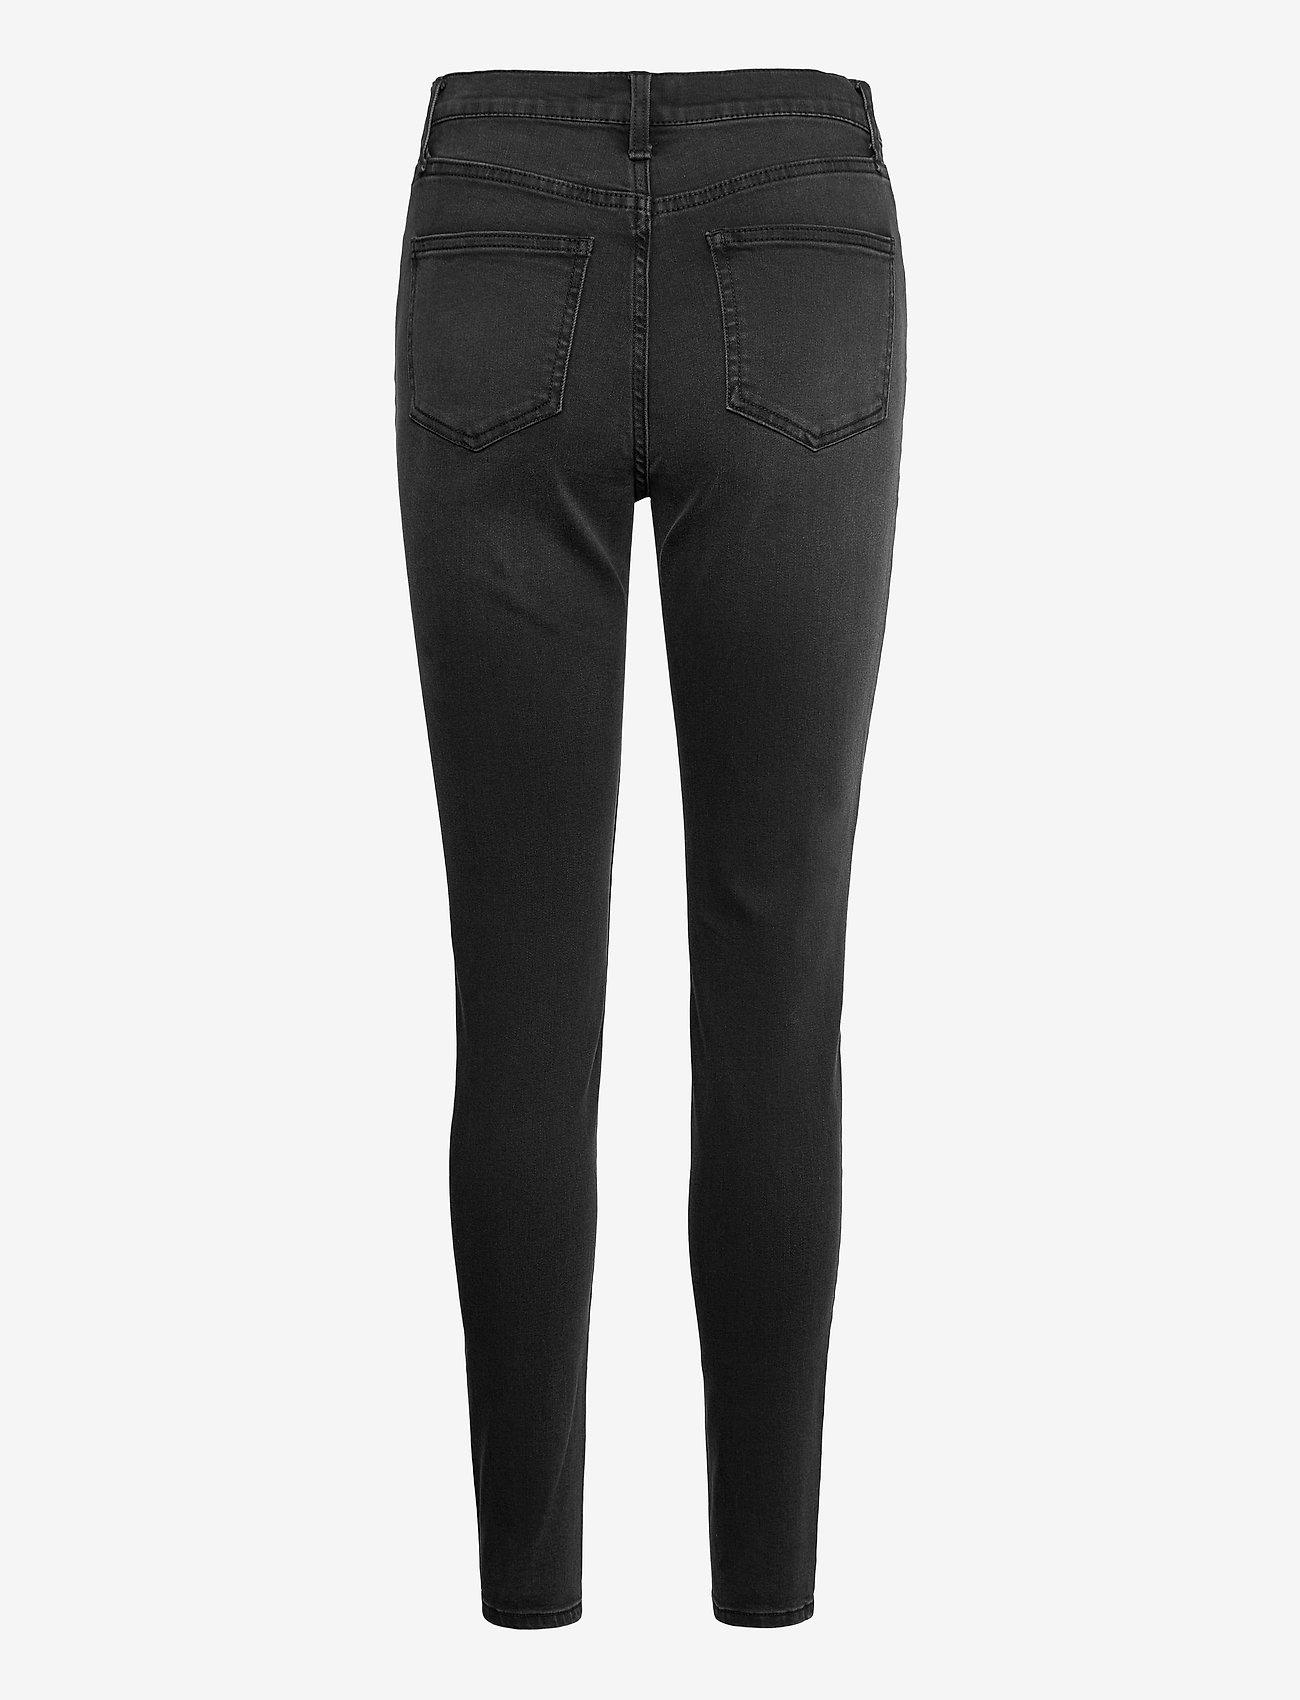 FREE/QUENT - FQHARLOW-JE-BLACK - slim jeans - black - 1